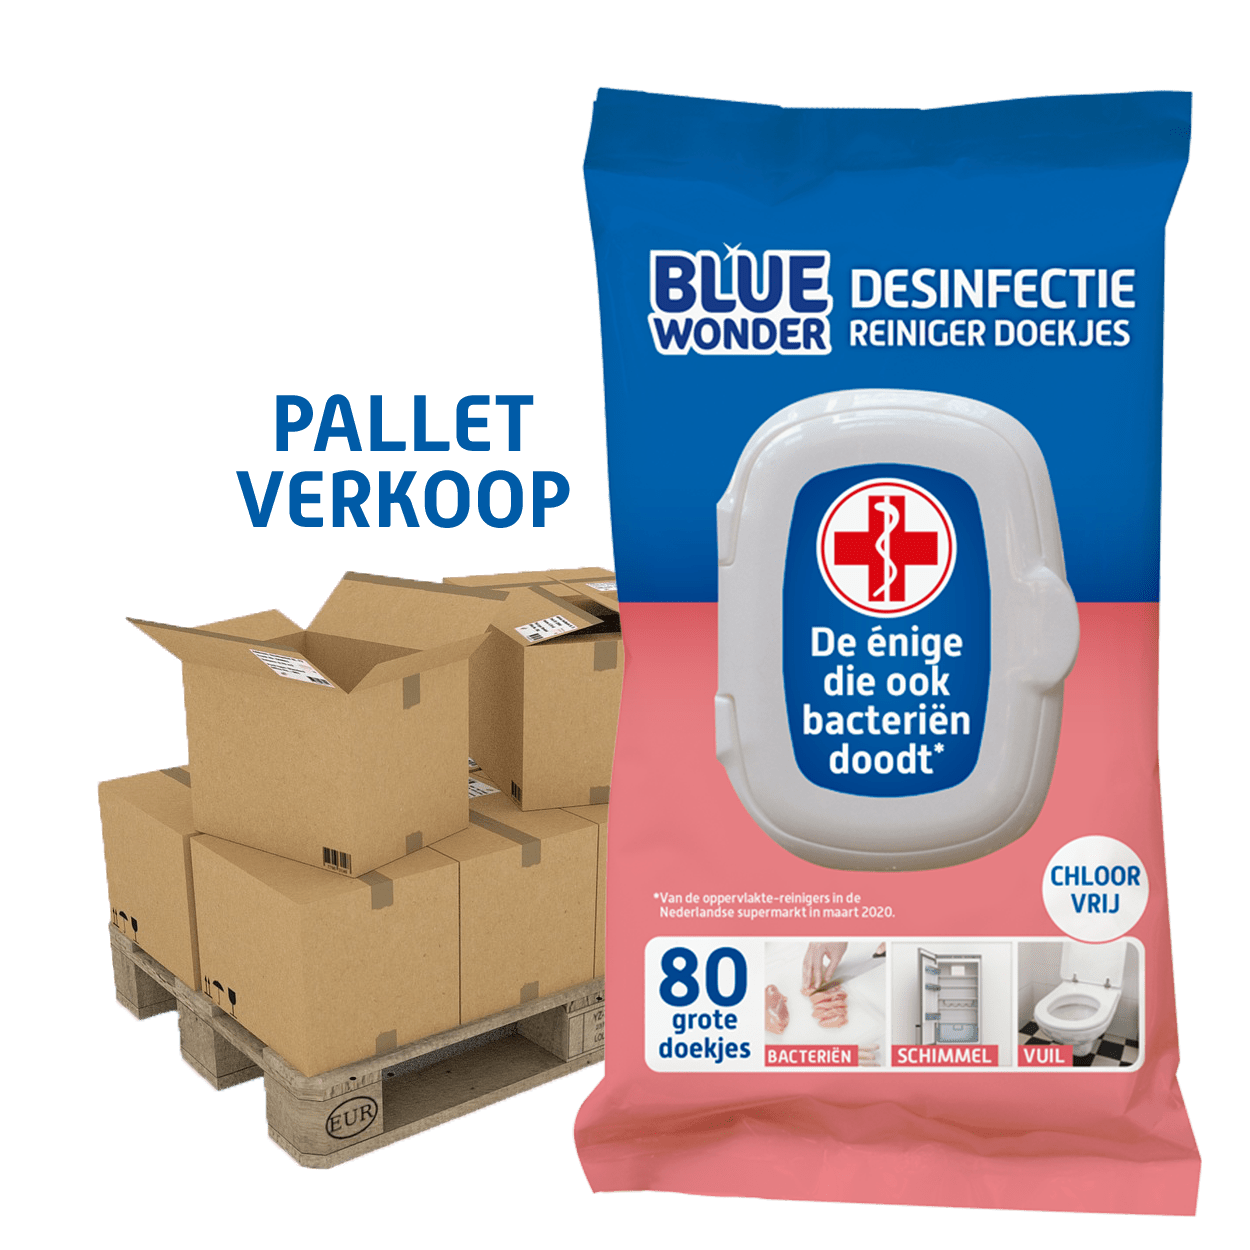 8712038001707_Blue-Wonder_Desinfectie-reiniger-doekjes-80stuks-PALLET